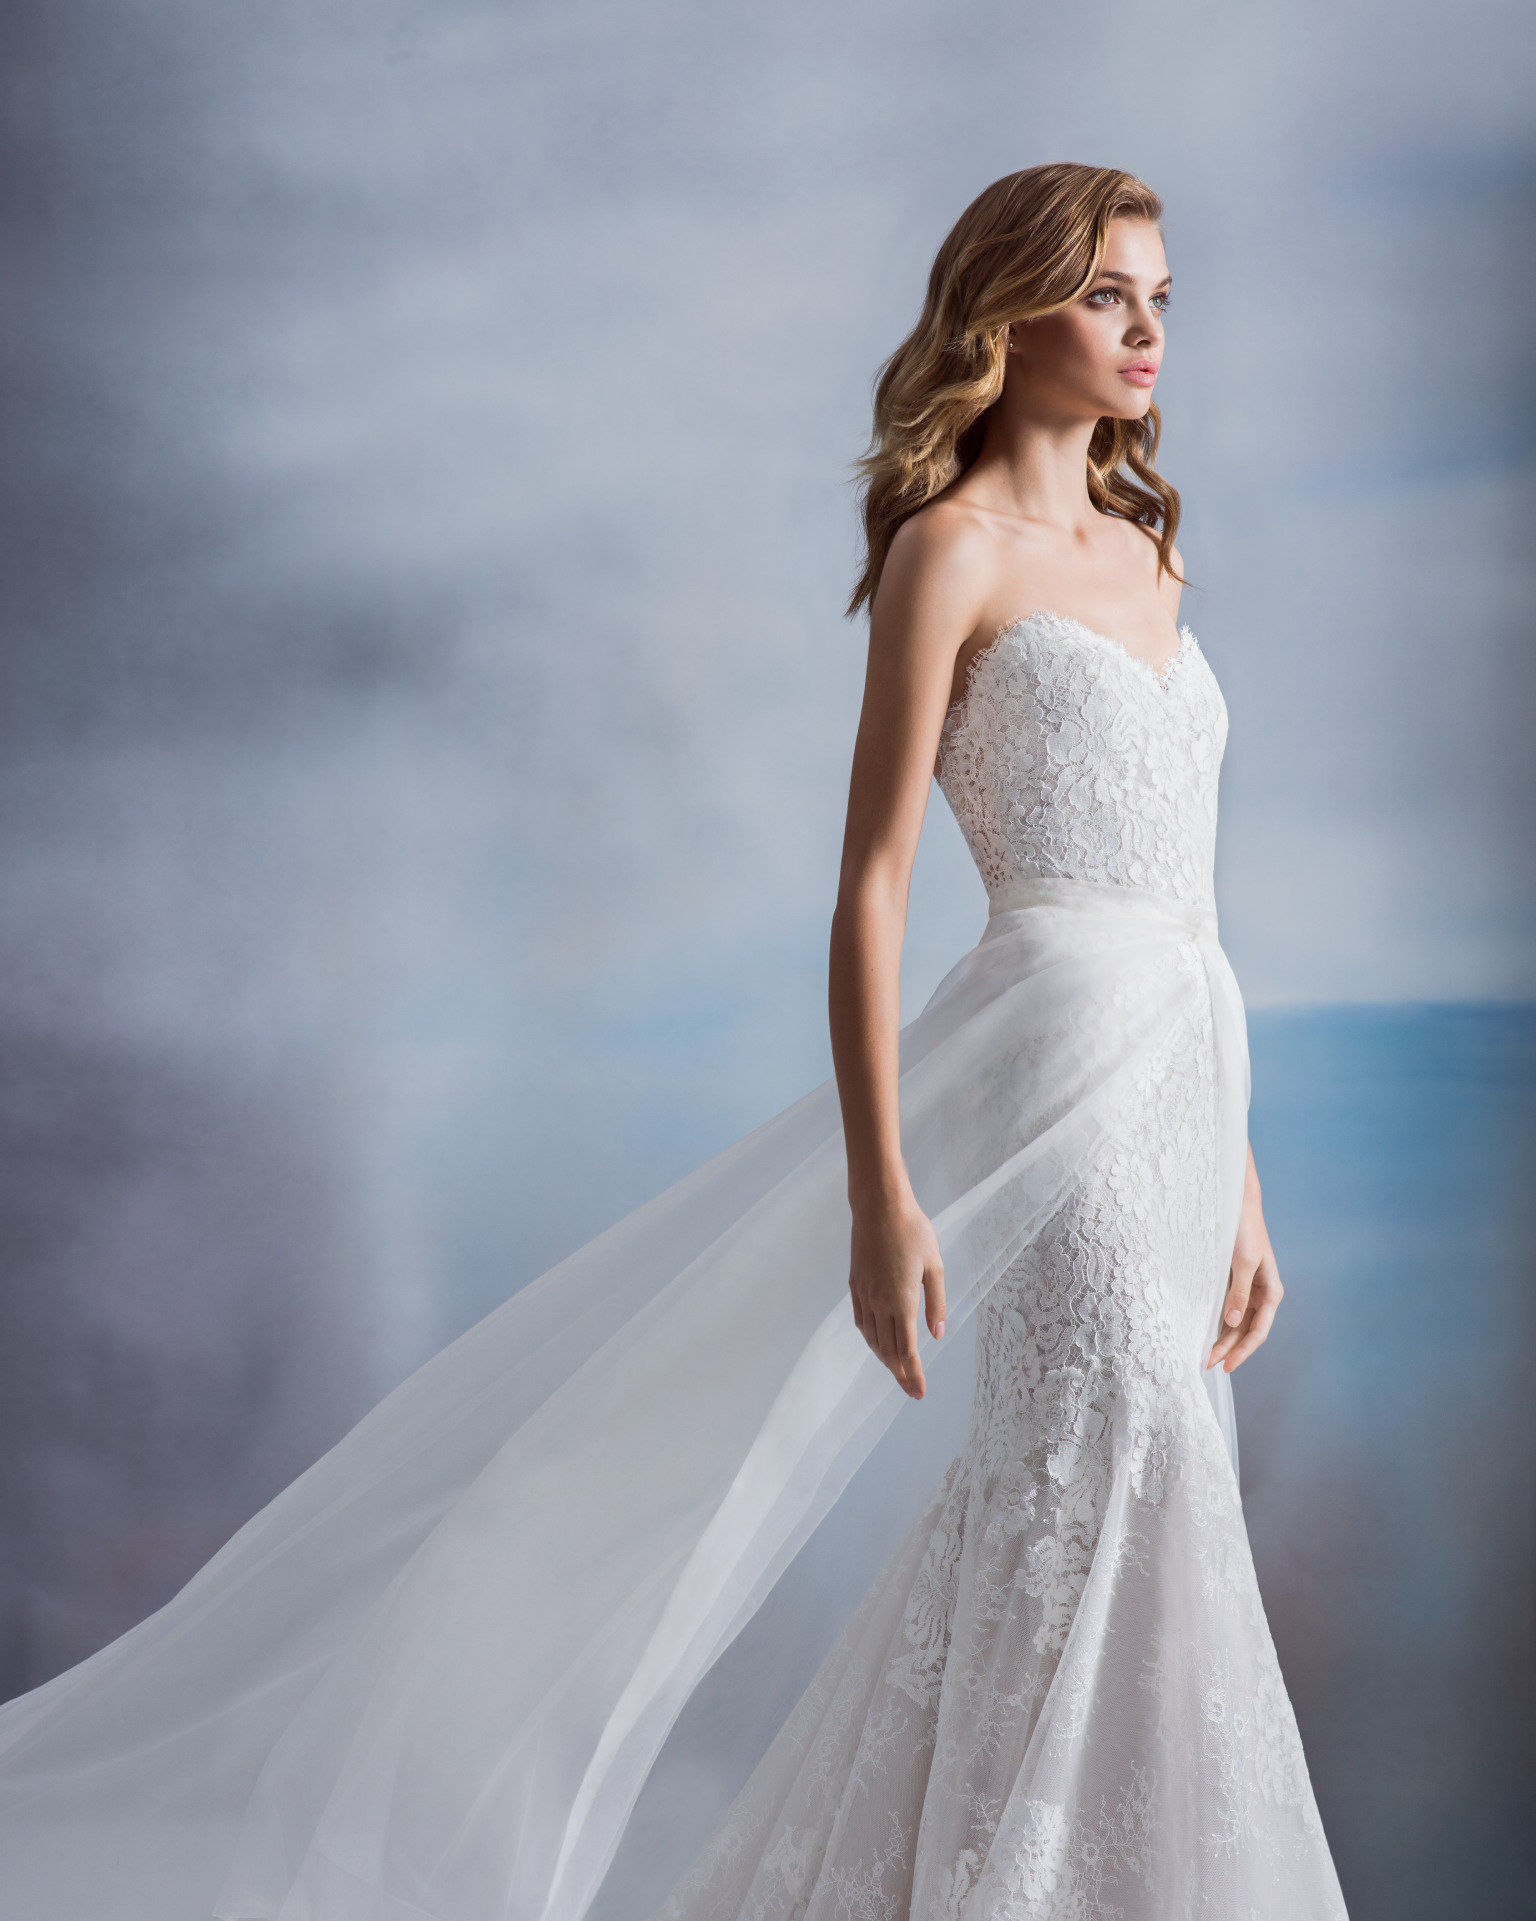 allison-webb-bridal-spring-2018-style-4808-devereaux.jpeg